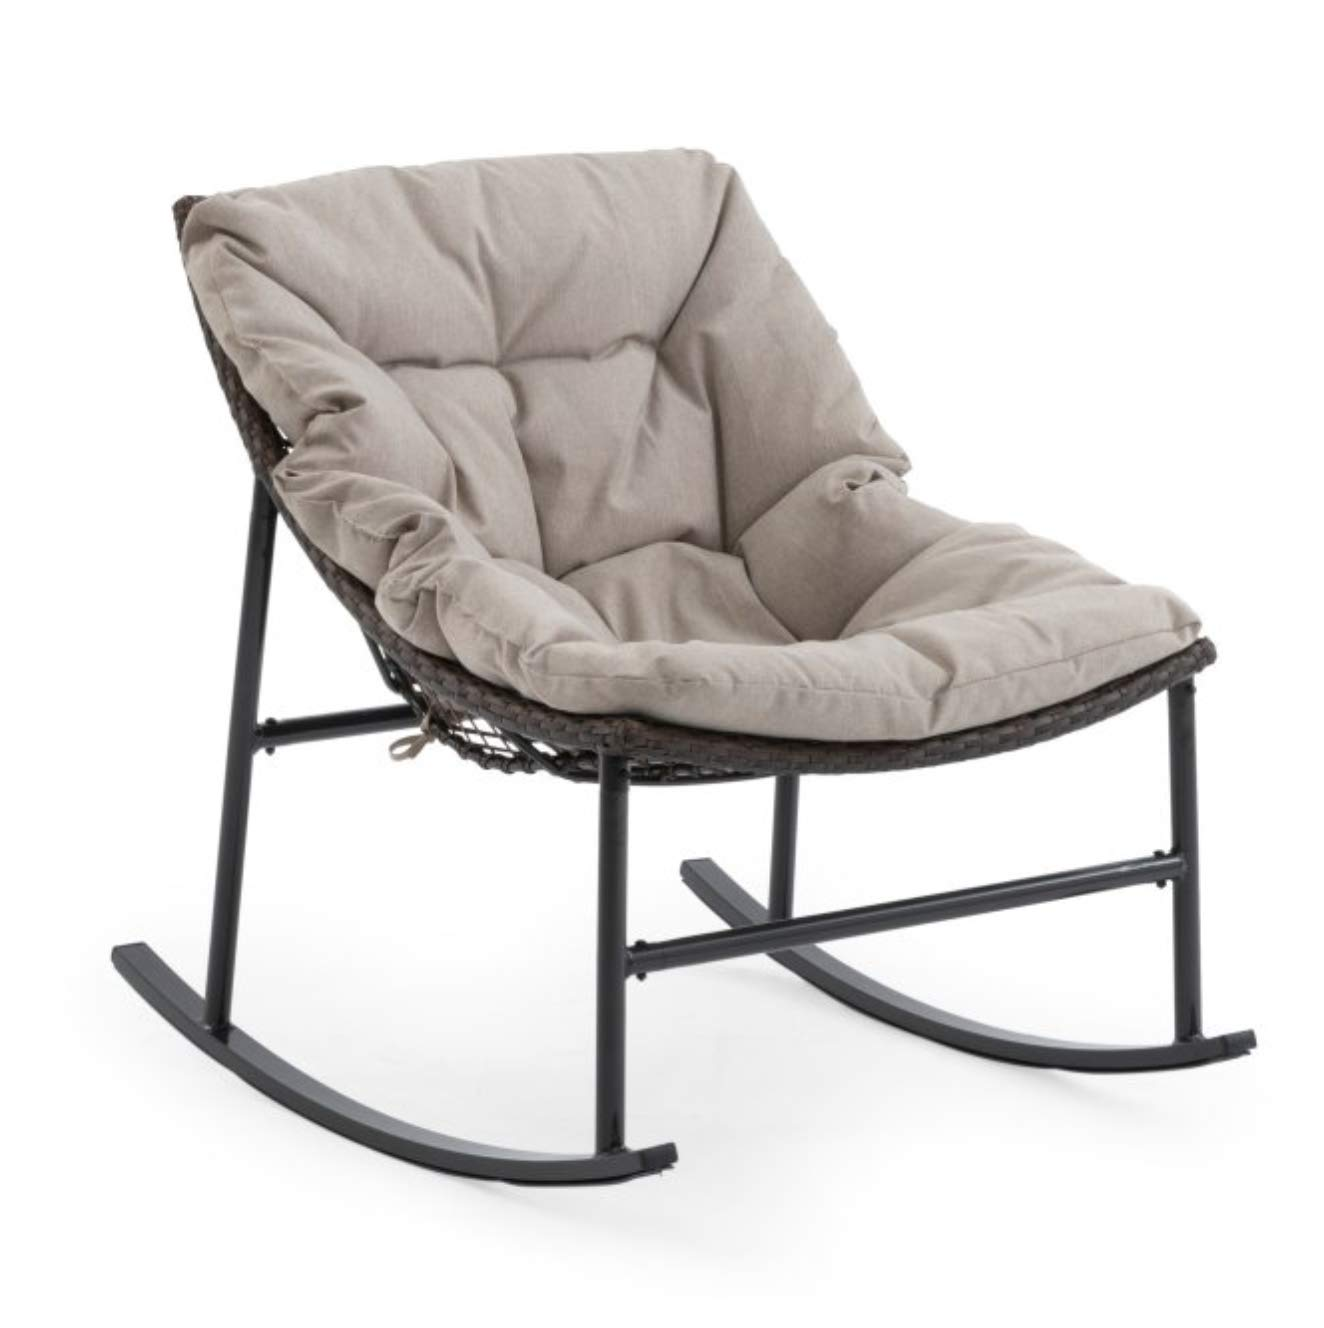 Amazoncom Palos Home Resin Wicker Outdoor Patio Rocking Chair